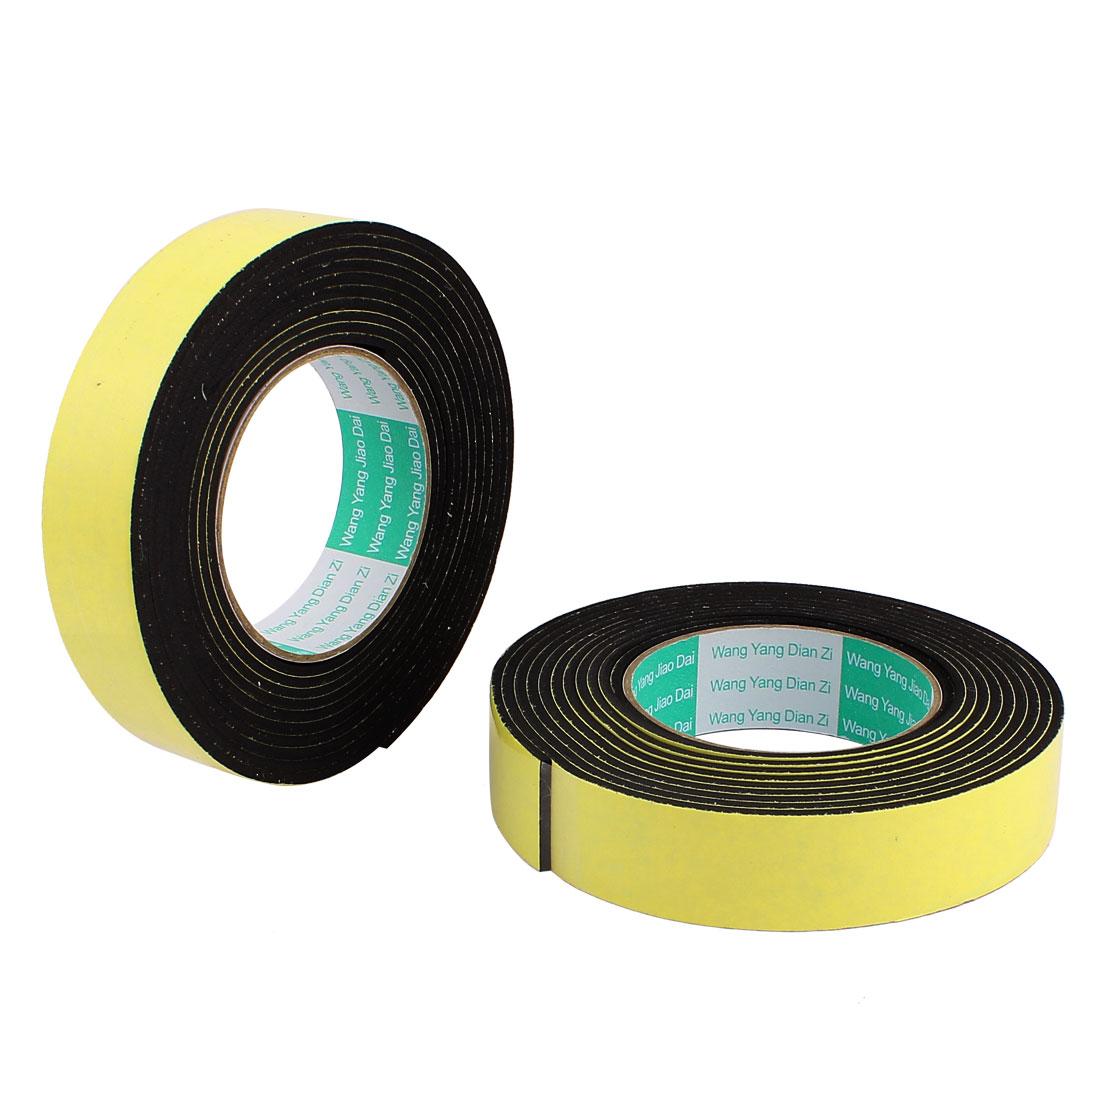 2 Pcs 3CM Width 4M Length 3MM Thick Single Sided Sealing Shockproof Sponge Tape